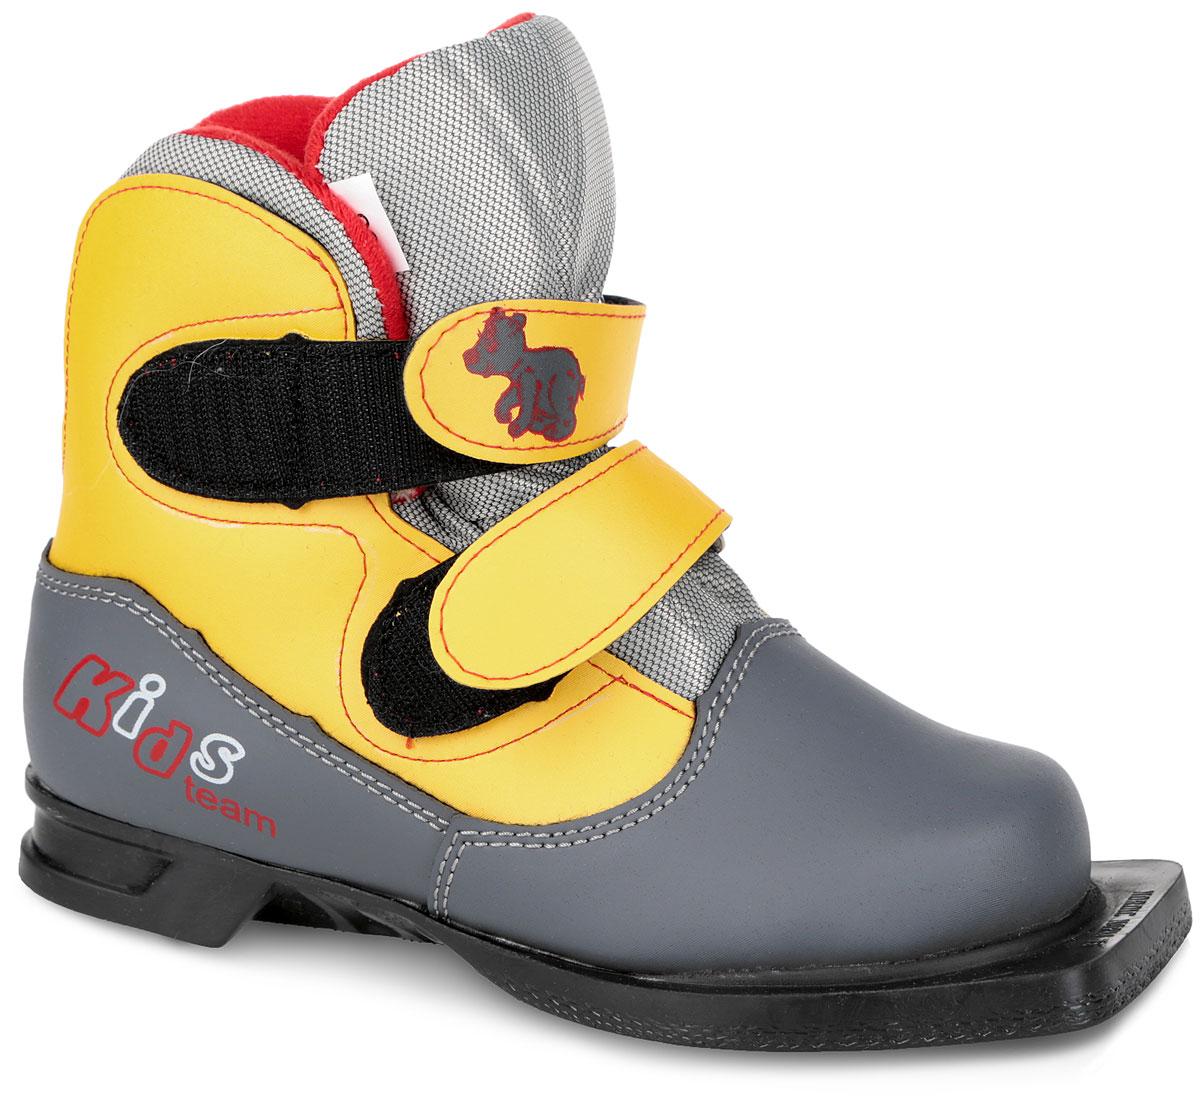 Ботинки лыжные детские Marax, цвет: серый, желтый. NN75. Размер 34